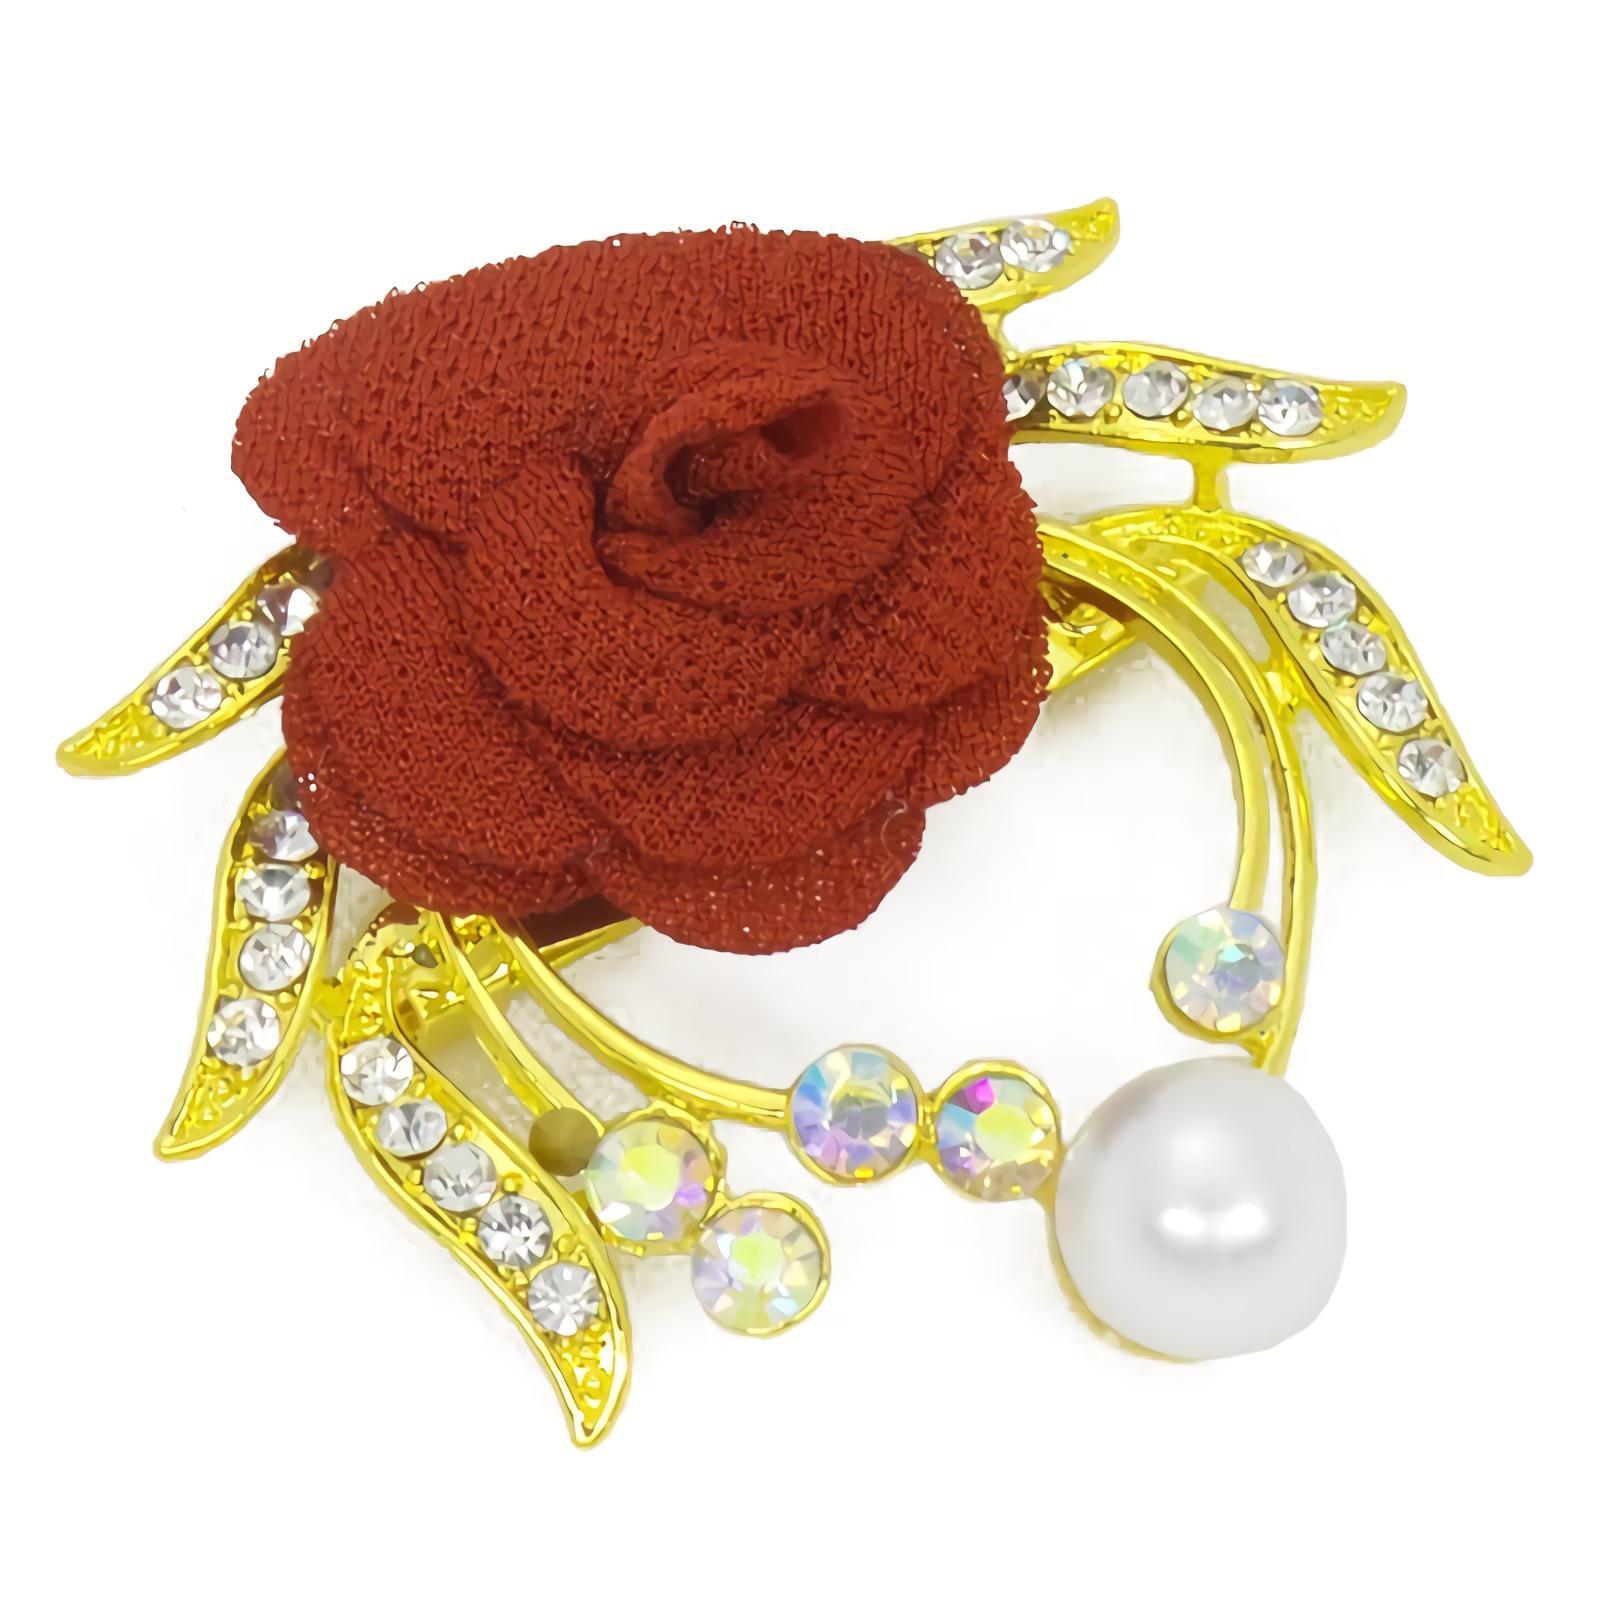 OFASHION Aksesoris Bros [1 Pcs] CA-618-B Hijab Jilbab Mawar Fashion Jewelry Xuping Emas Merah